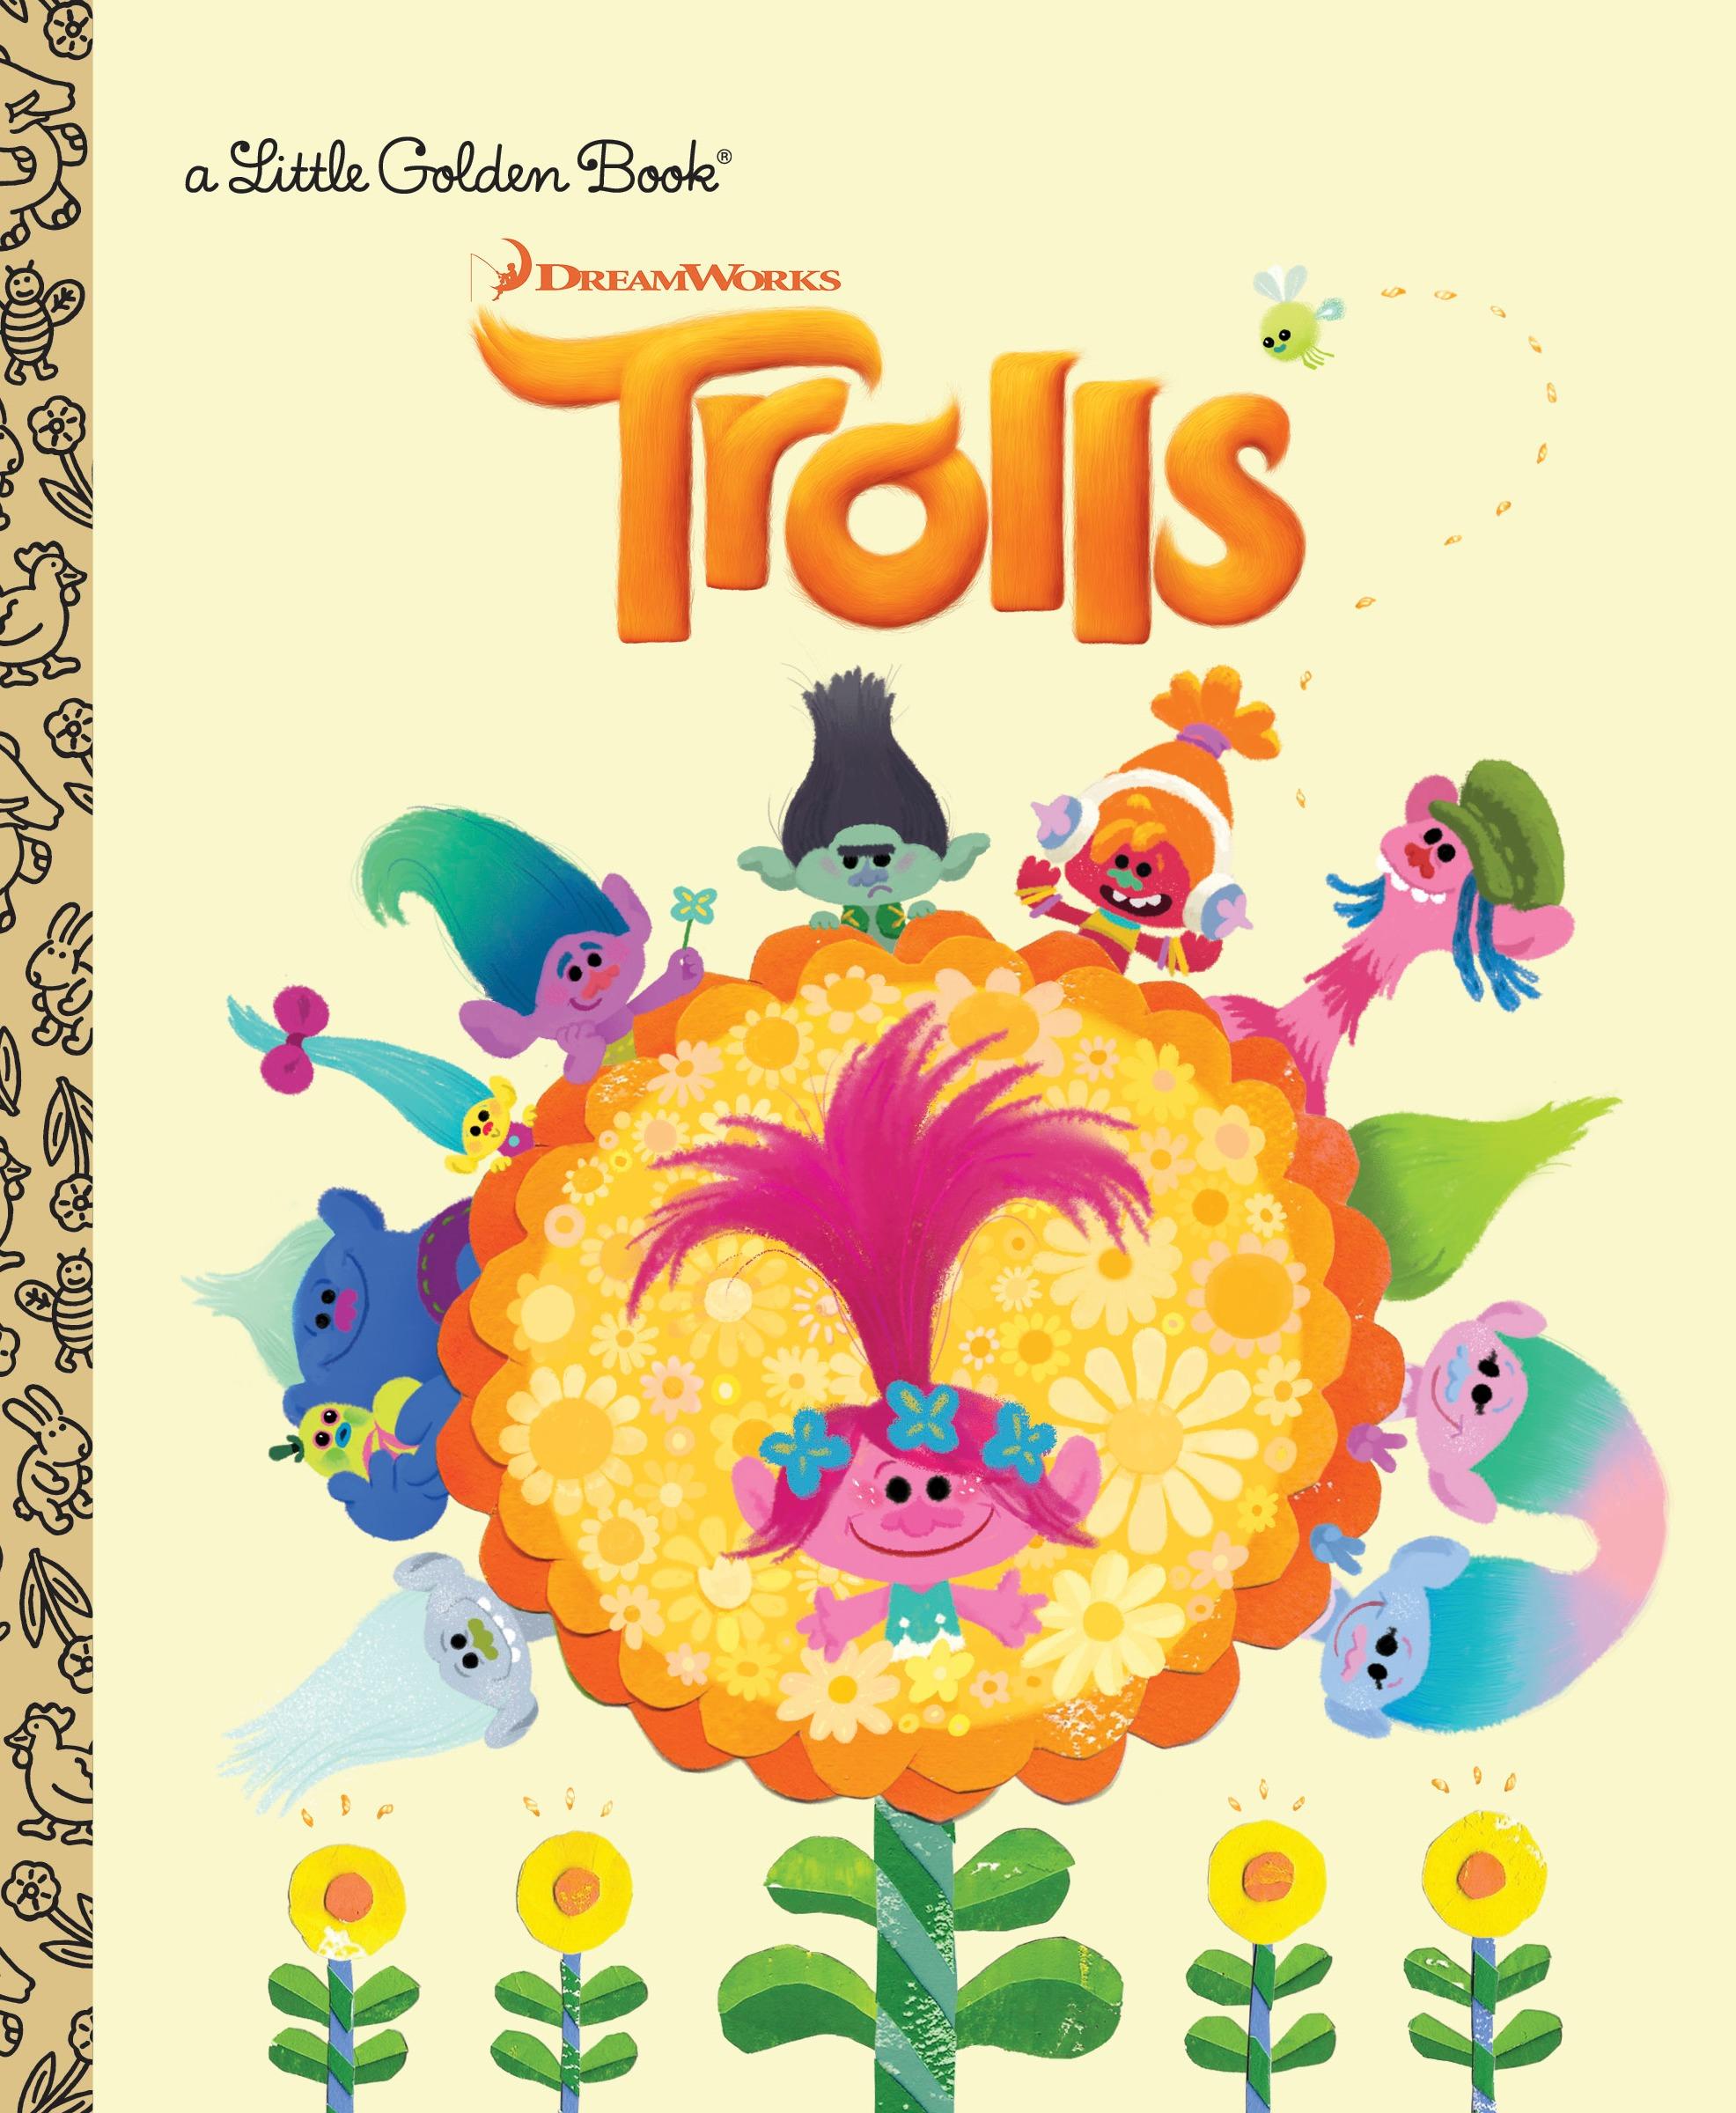 Trolls Little Golden Book (DreamWorks Trolls)